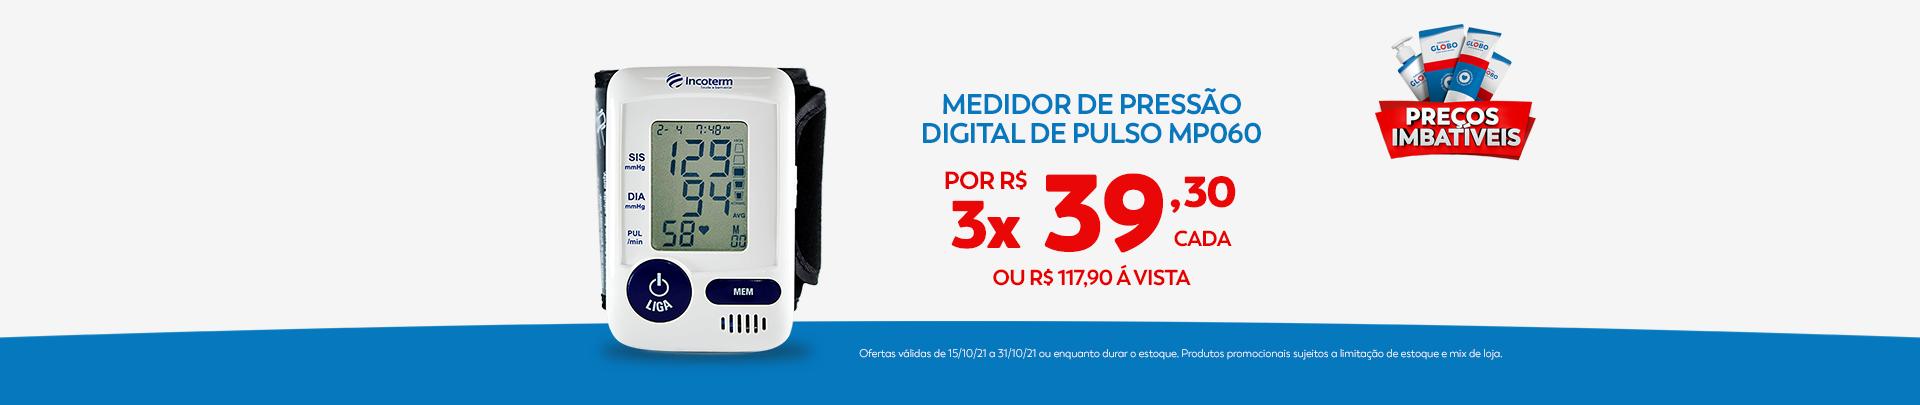 MedidordePressão_